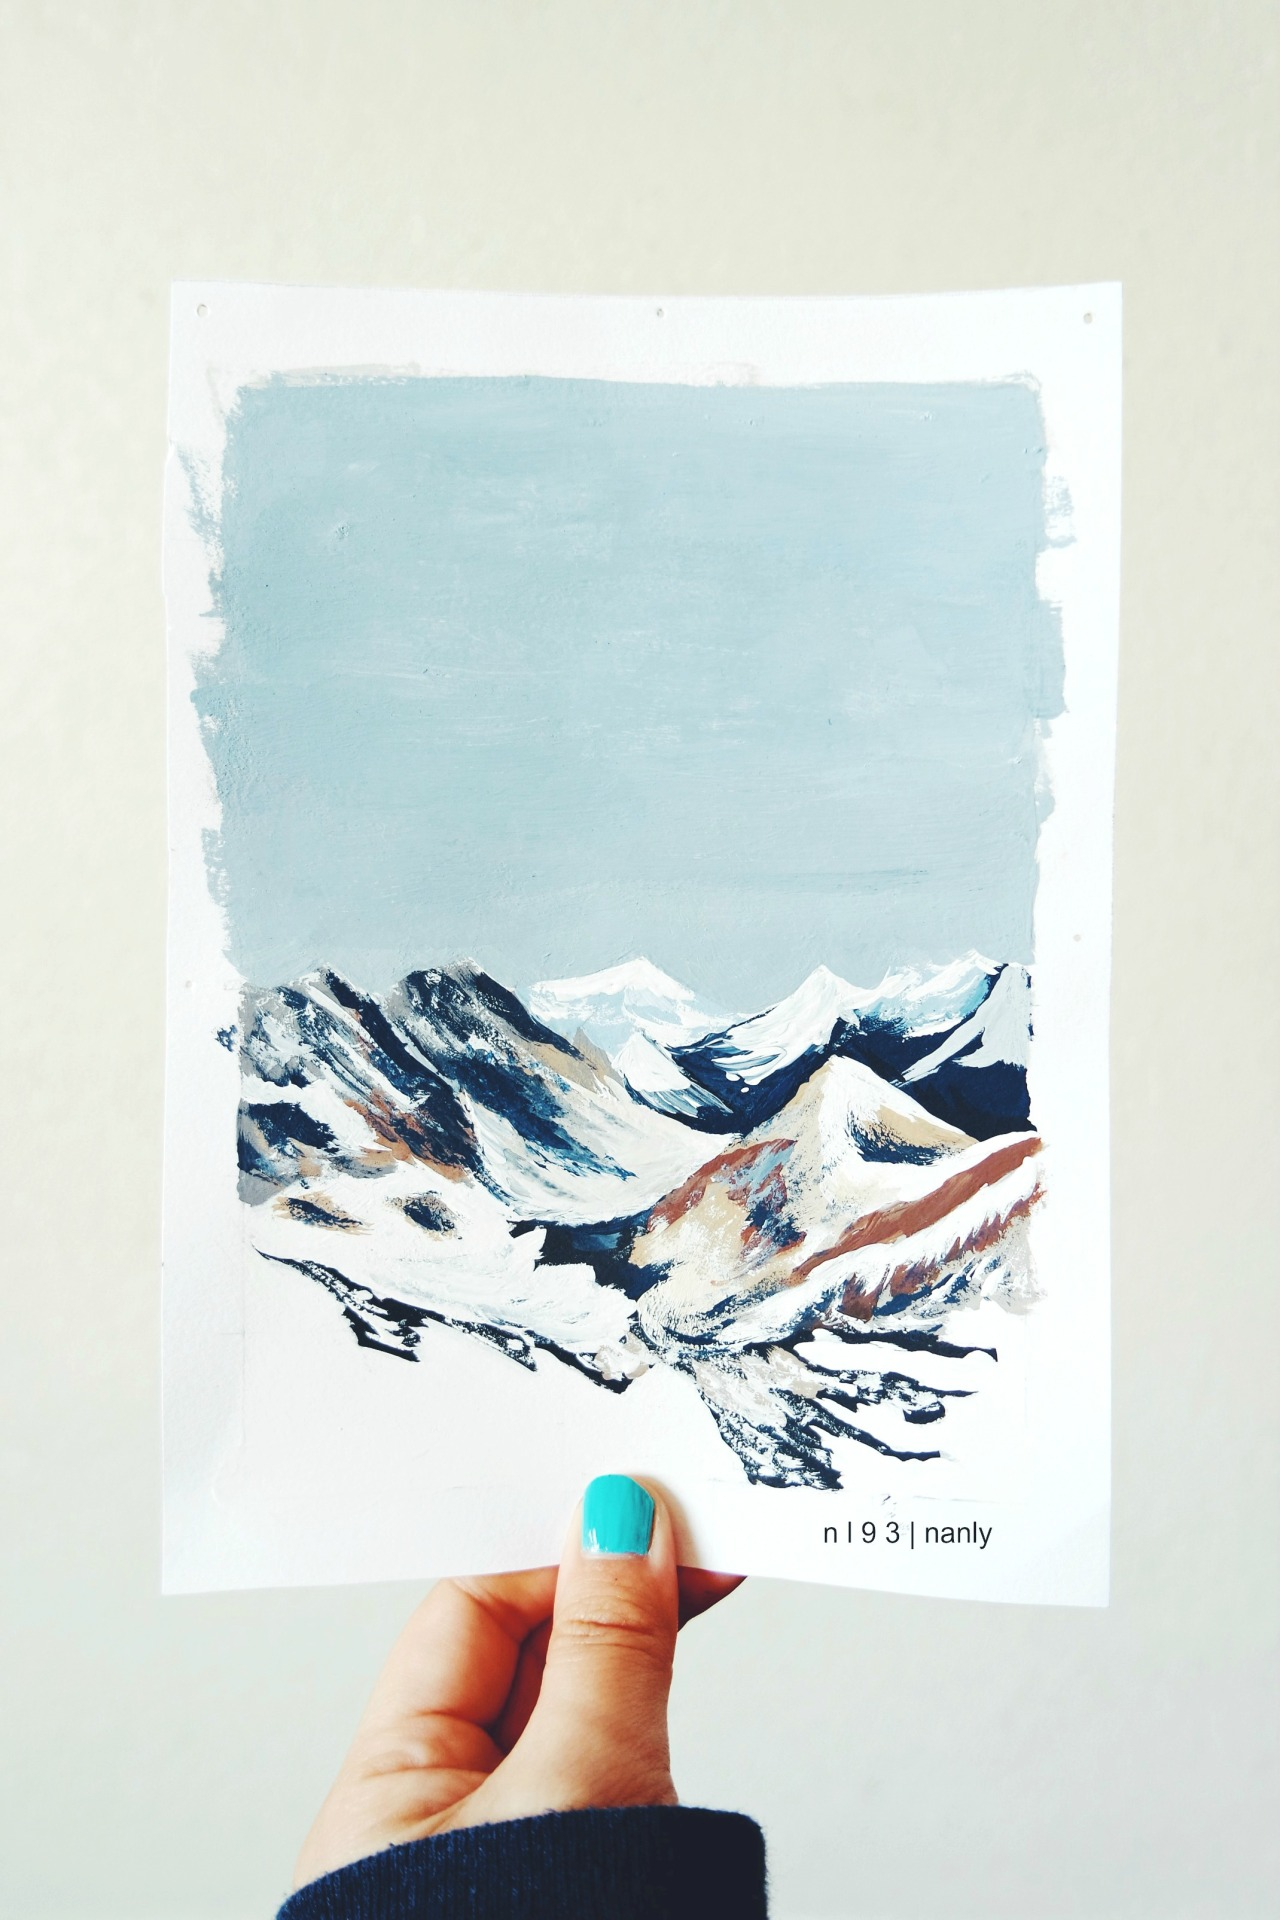 1280x1920 Snow Beauty Winter Illustration Art Mine Life Landscape Draw